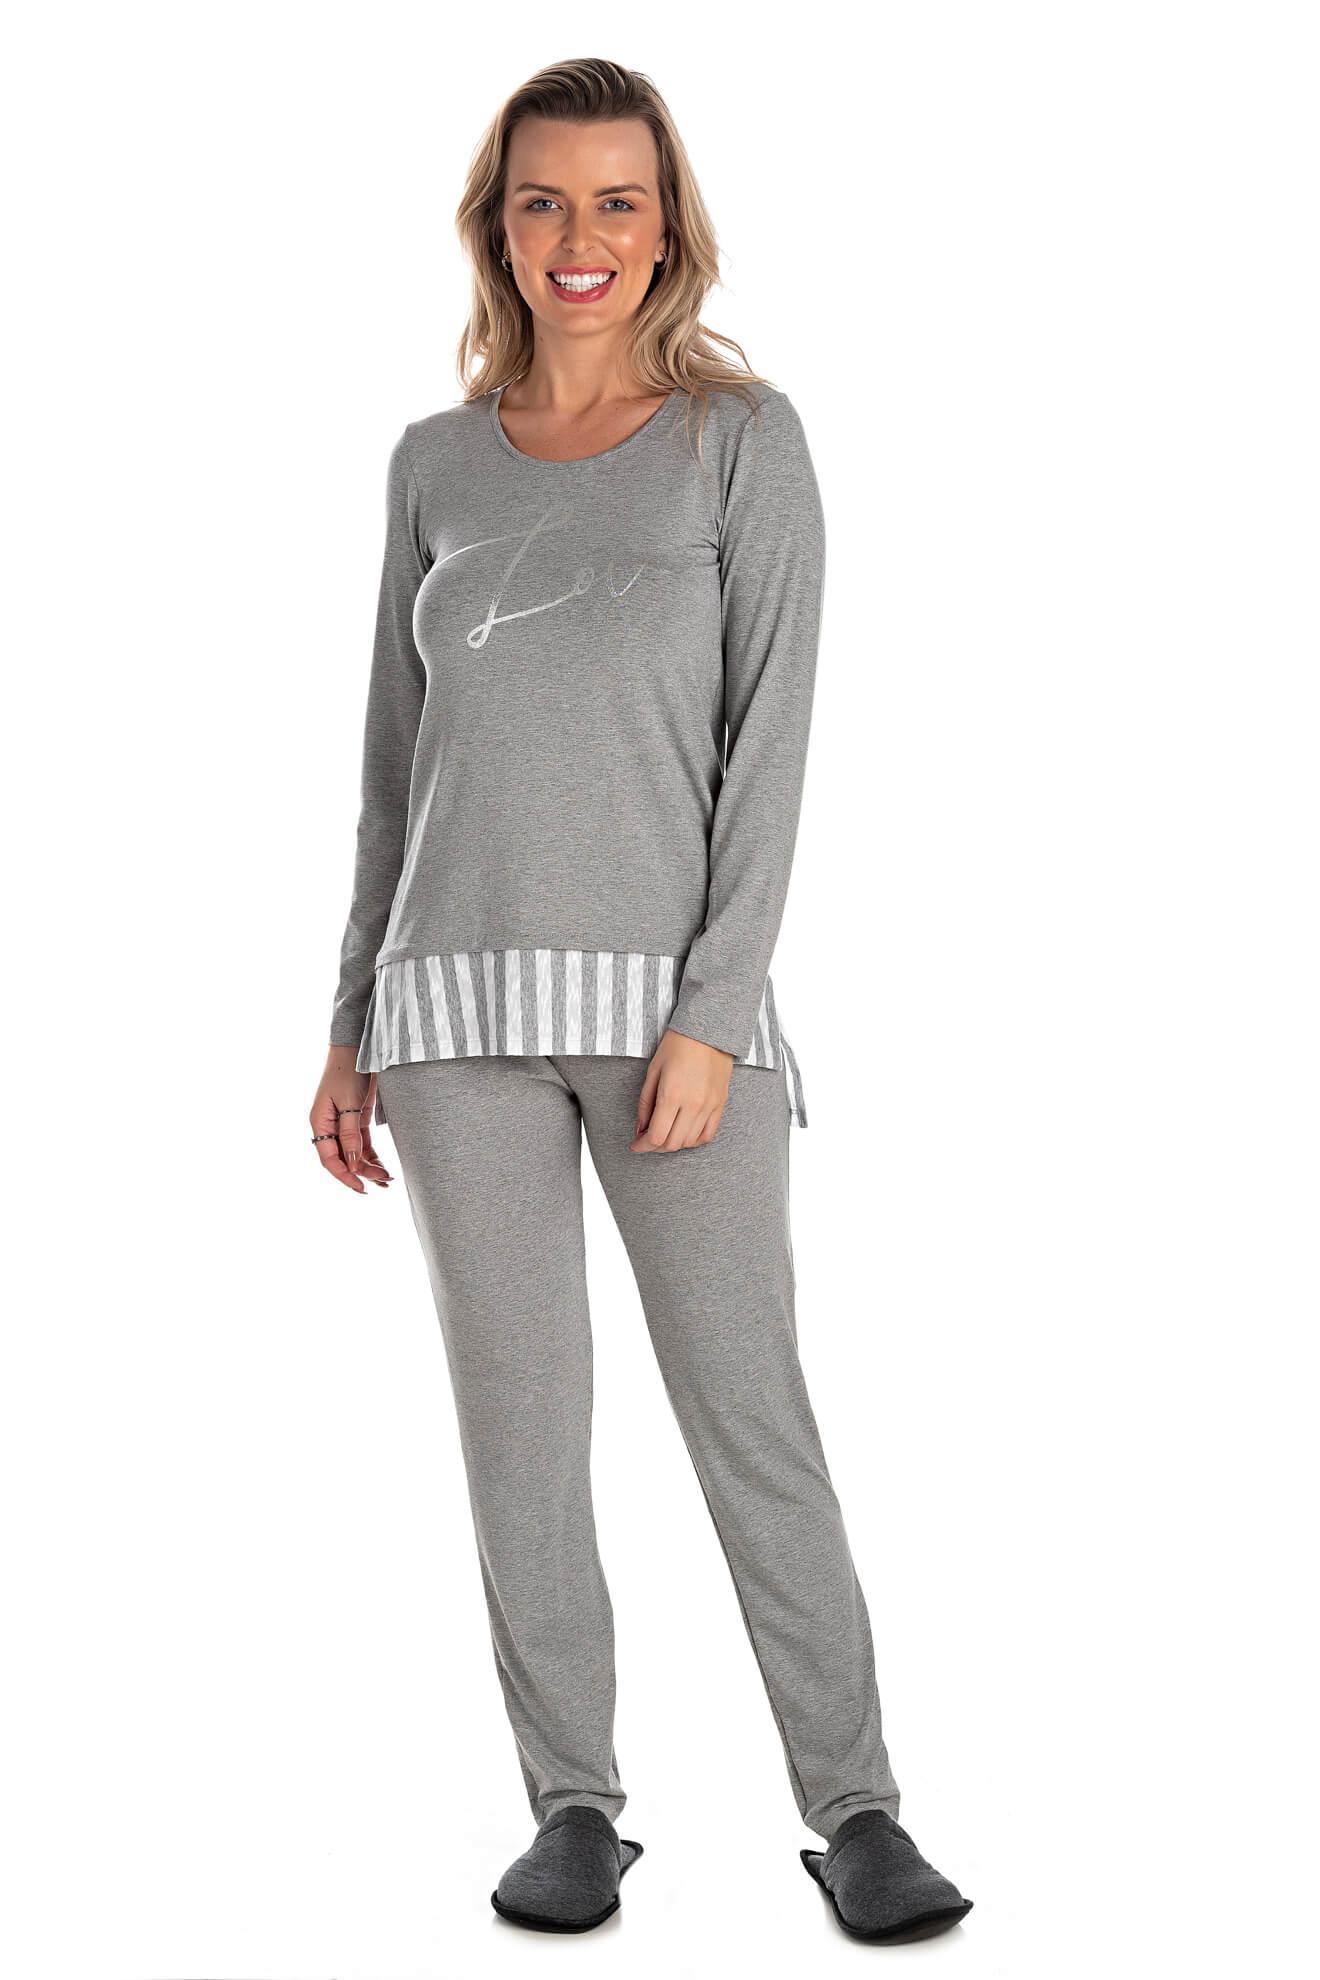 009/B - Pijama Longo Adulto Feminino Love